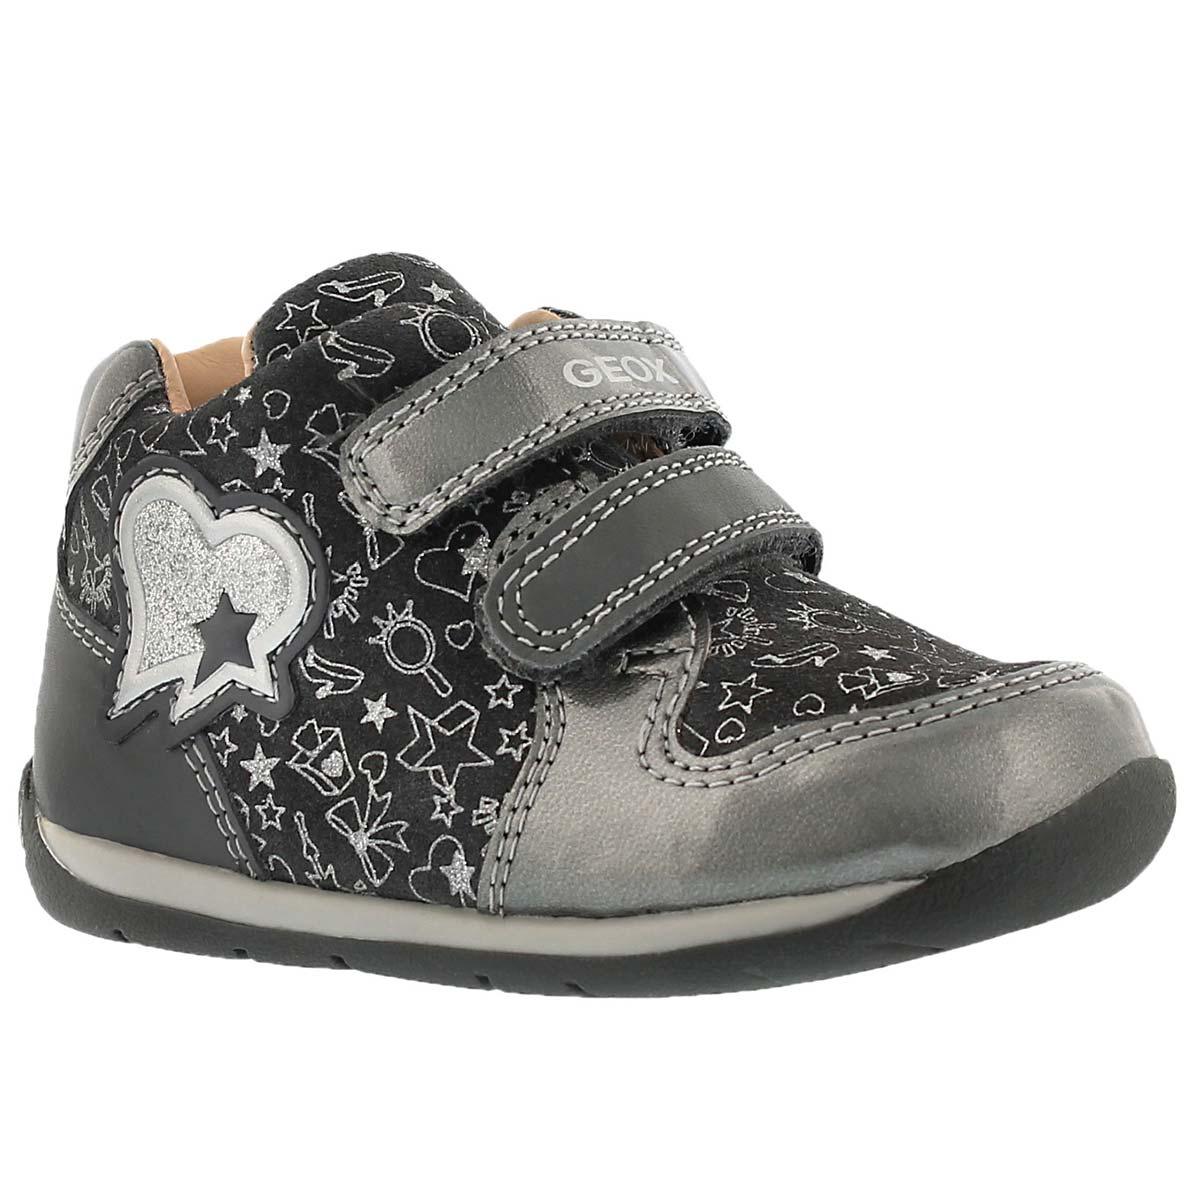 Inf Each C dark grey 2-strap sneaker